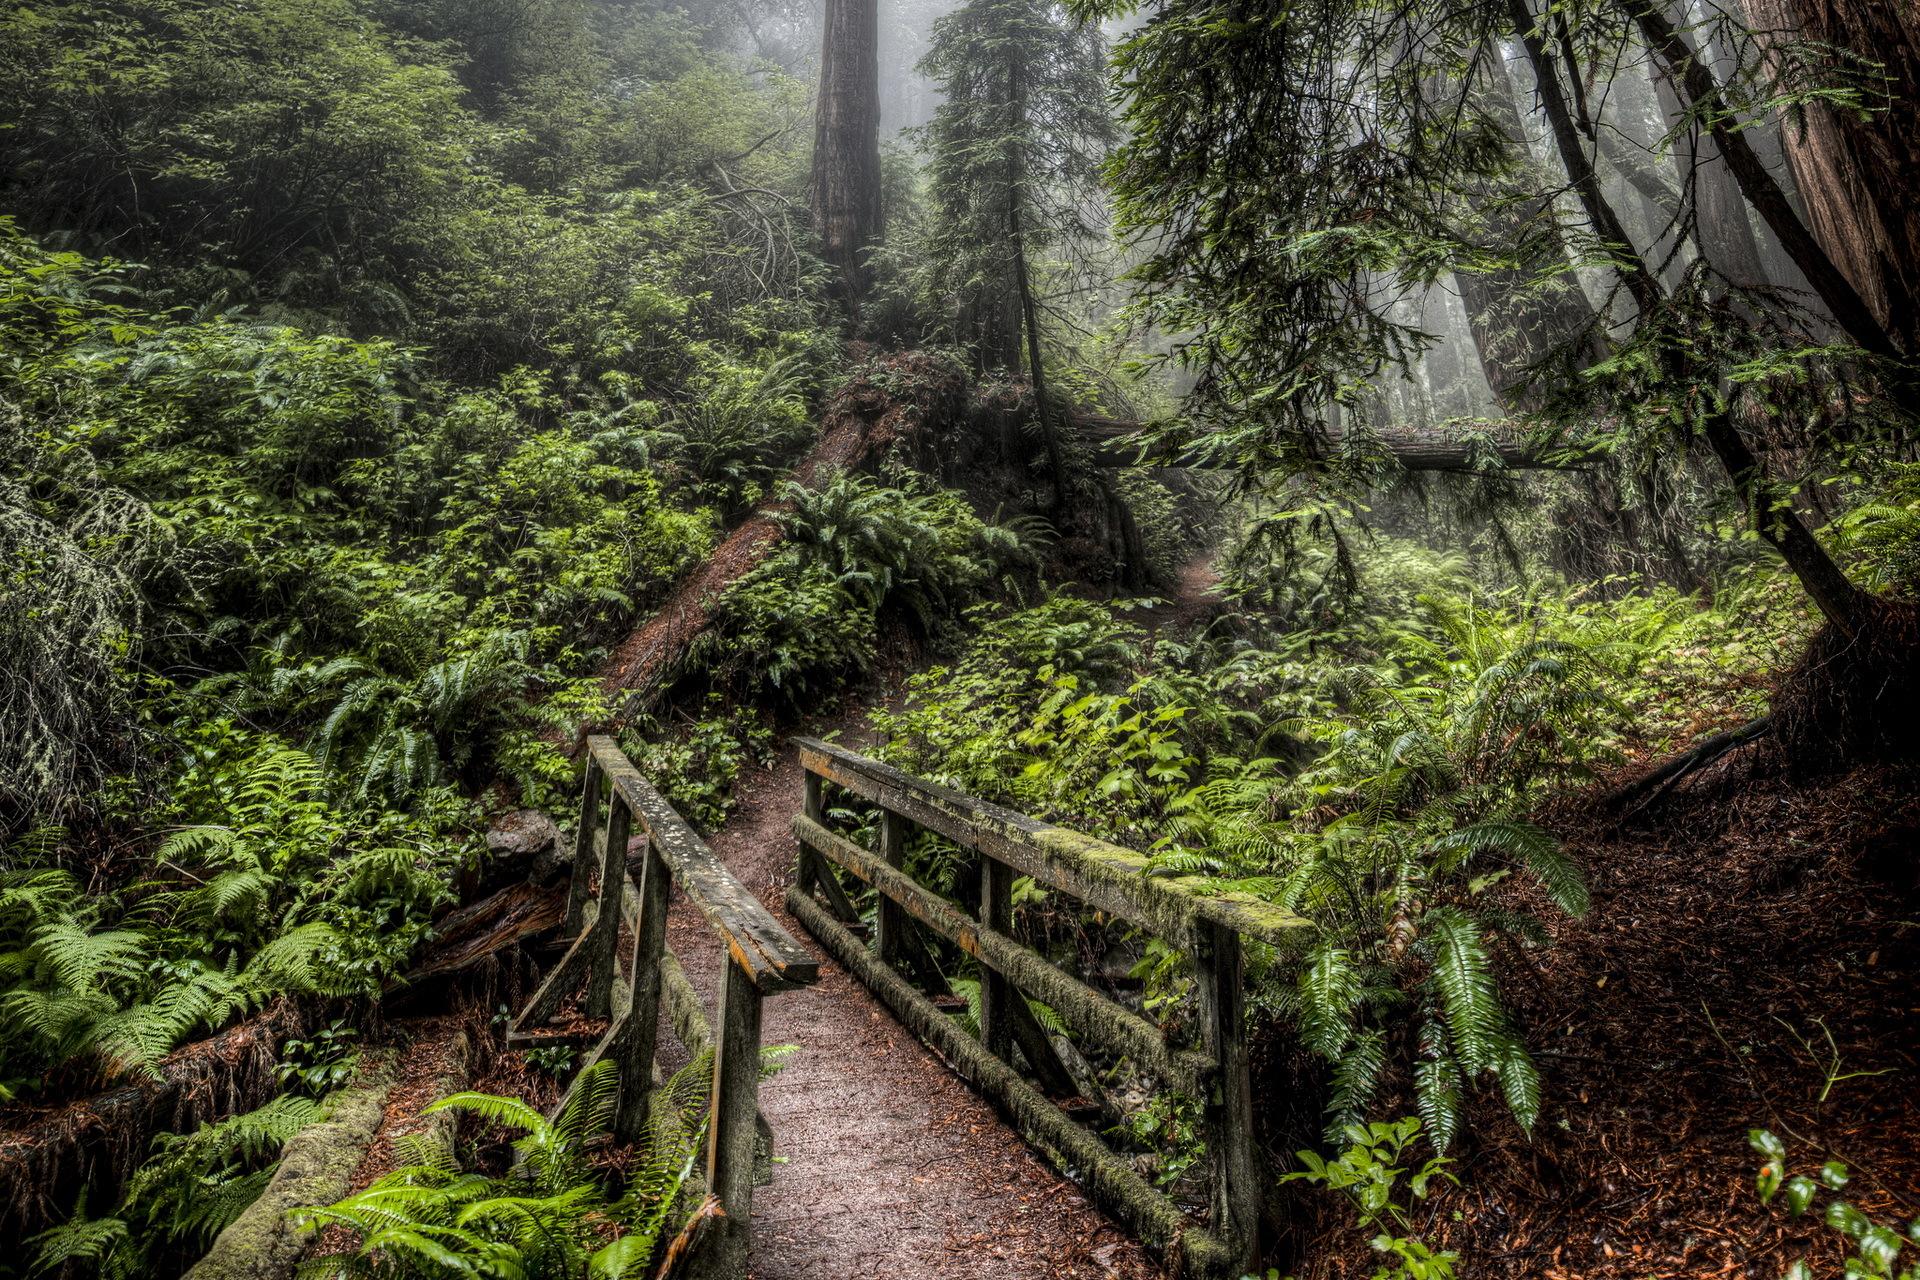 Nature Landscapes Trees Forest Plants Fern Architecture